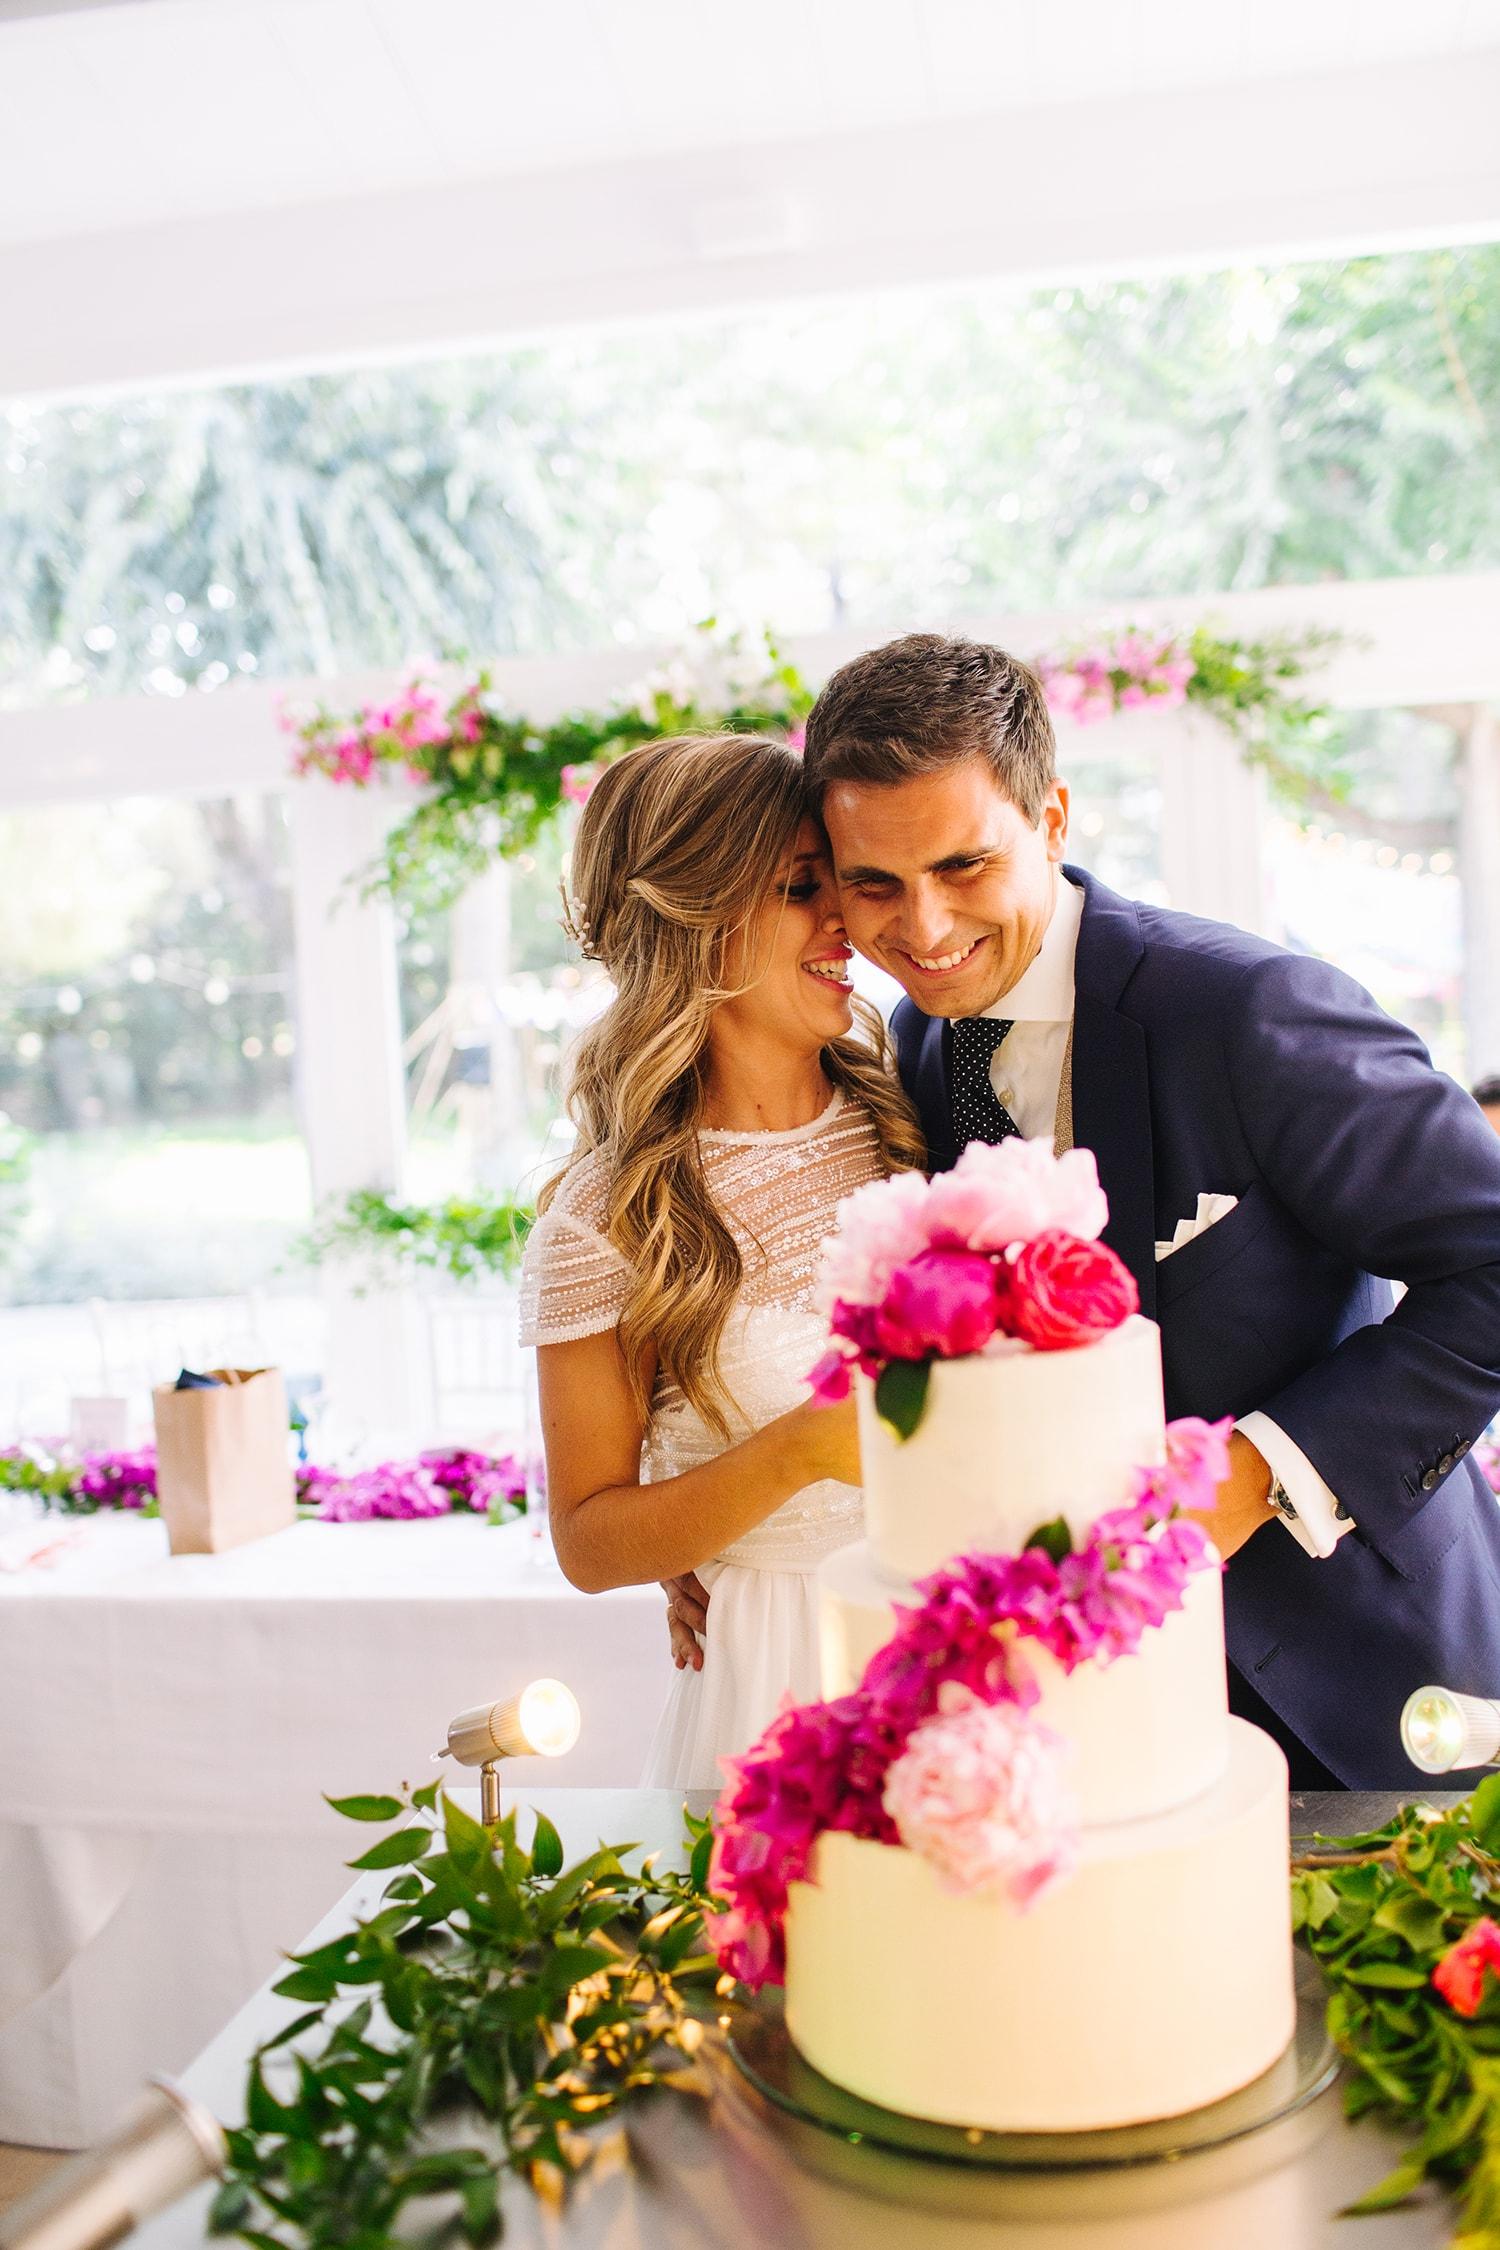 paulagfurio_bouganvillea_wedding_spain_075.jpg